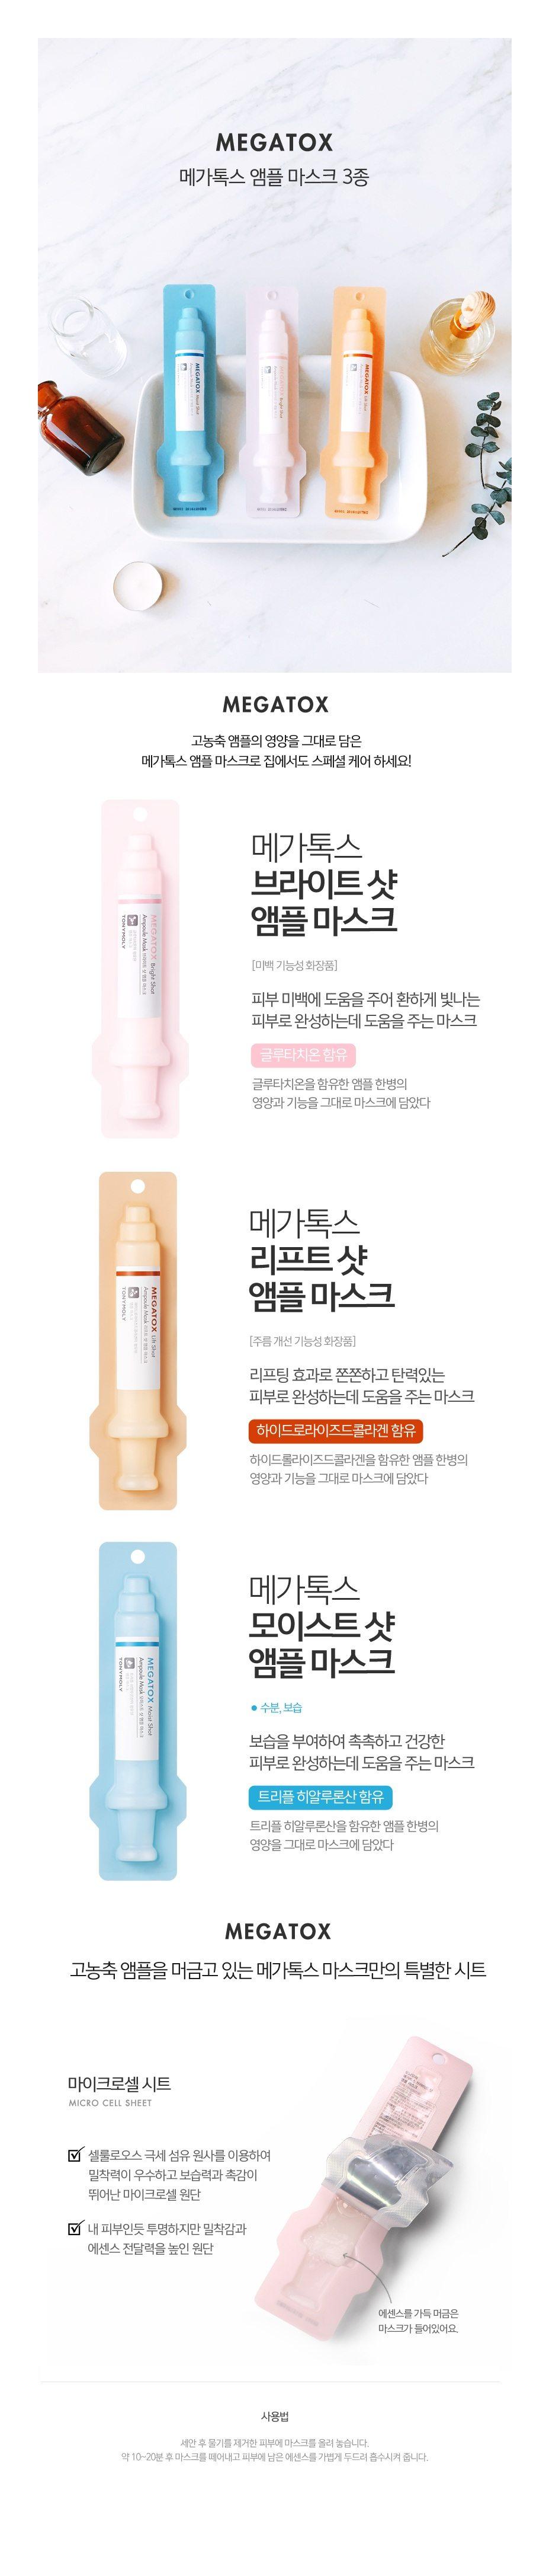 Tony Moly Megatox Ampoule Mask korean cosmetic skincare product online shop malaysia italy germany1